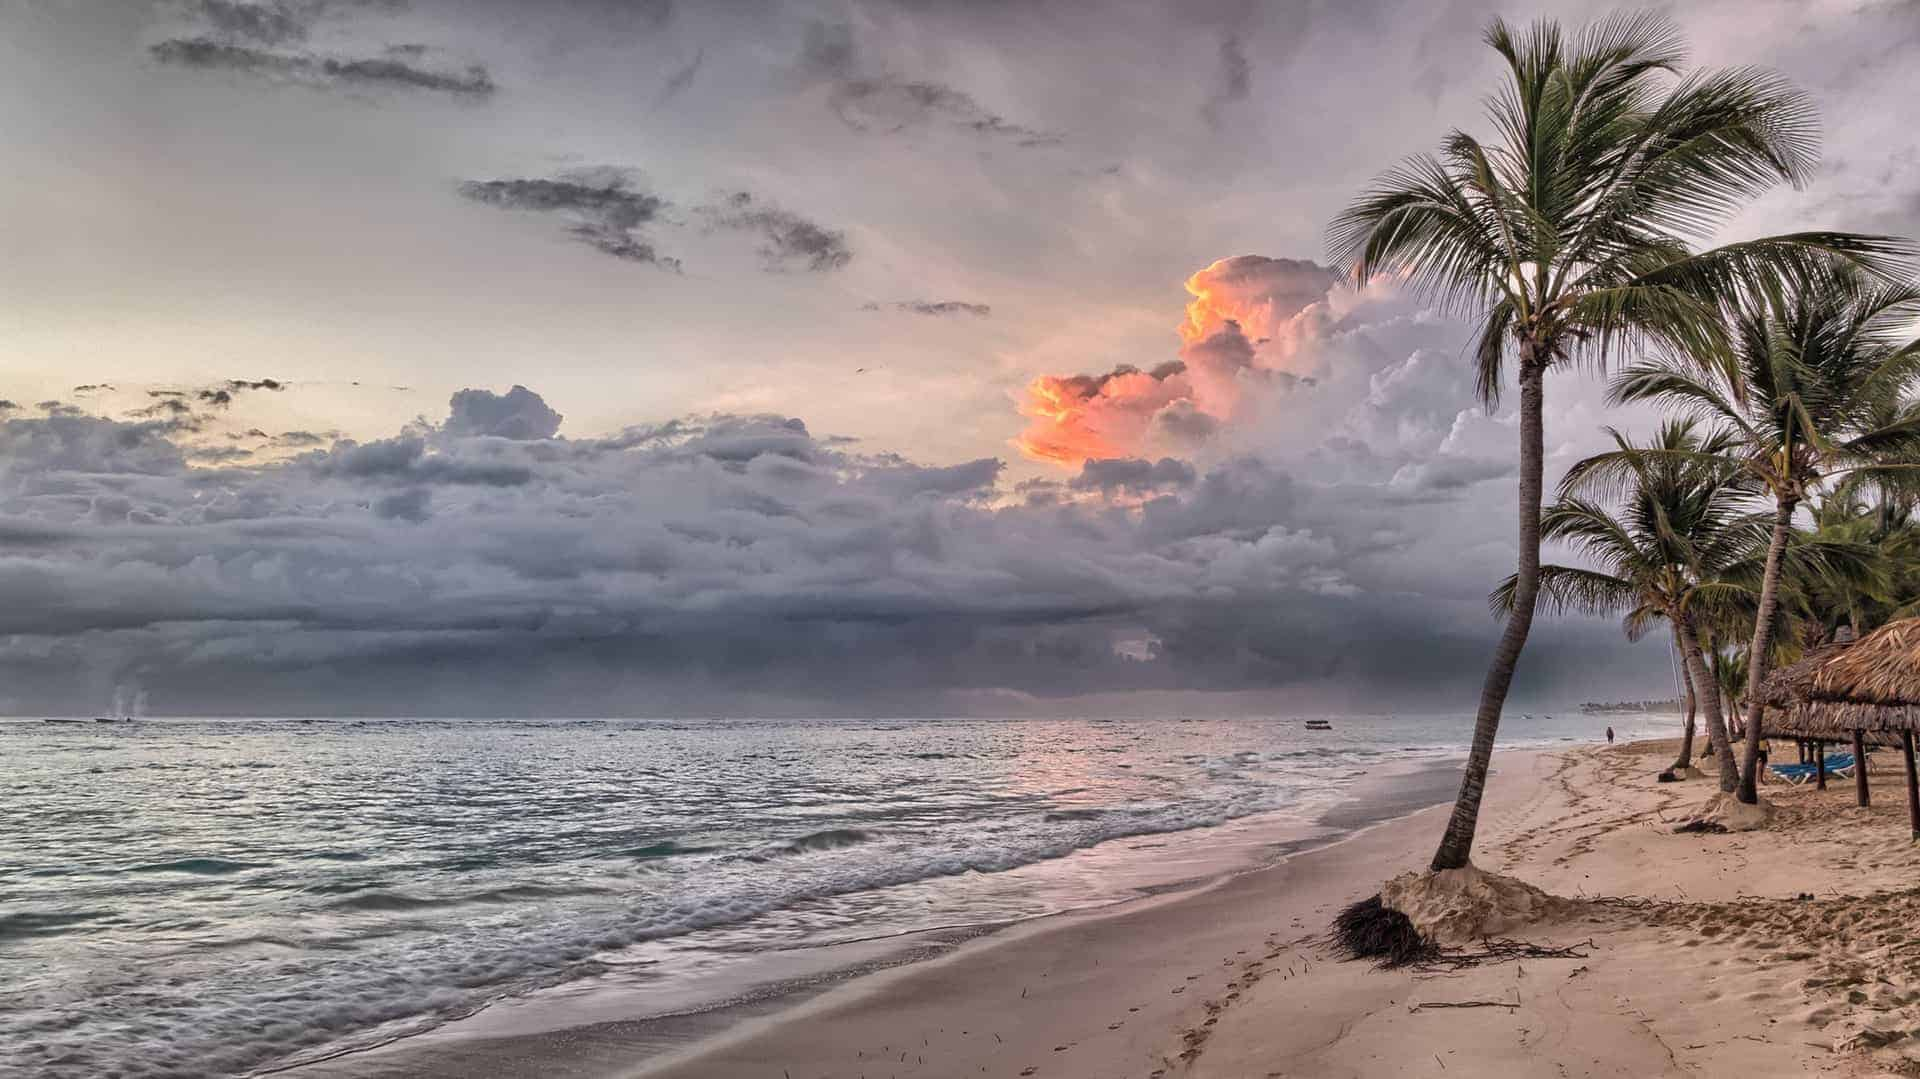 liburan pantai, musim panas